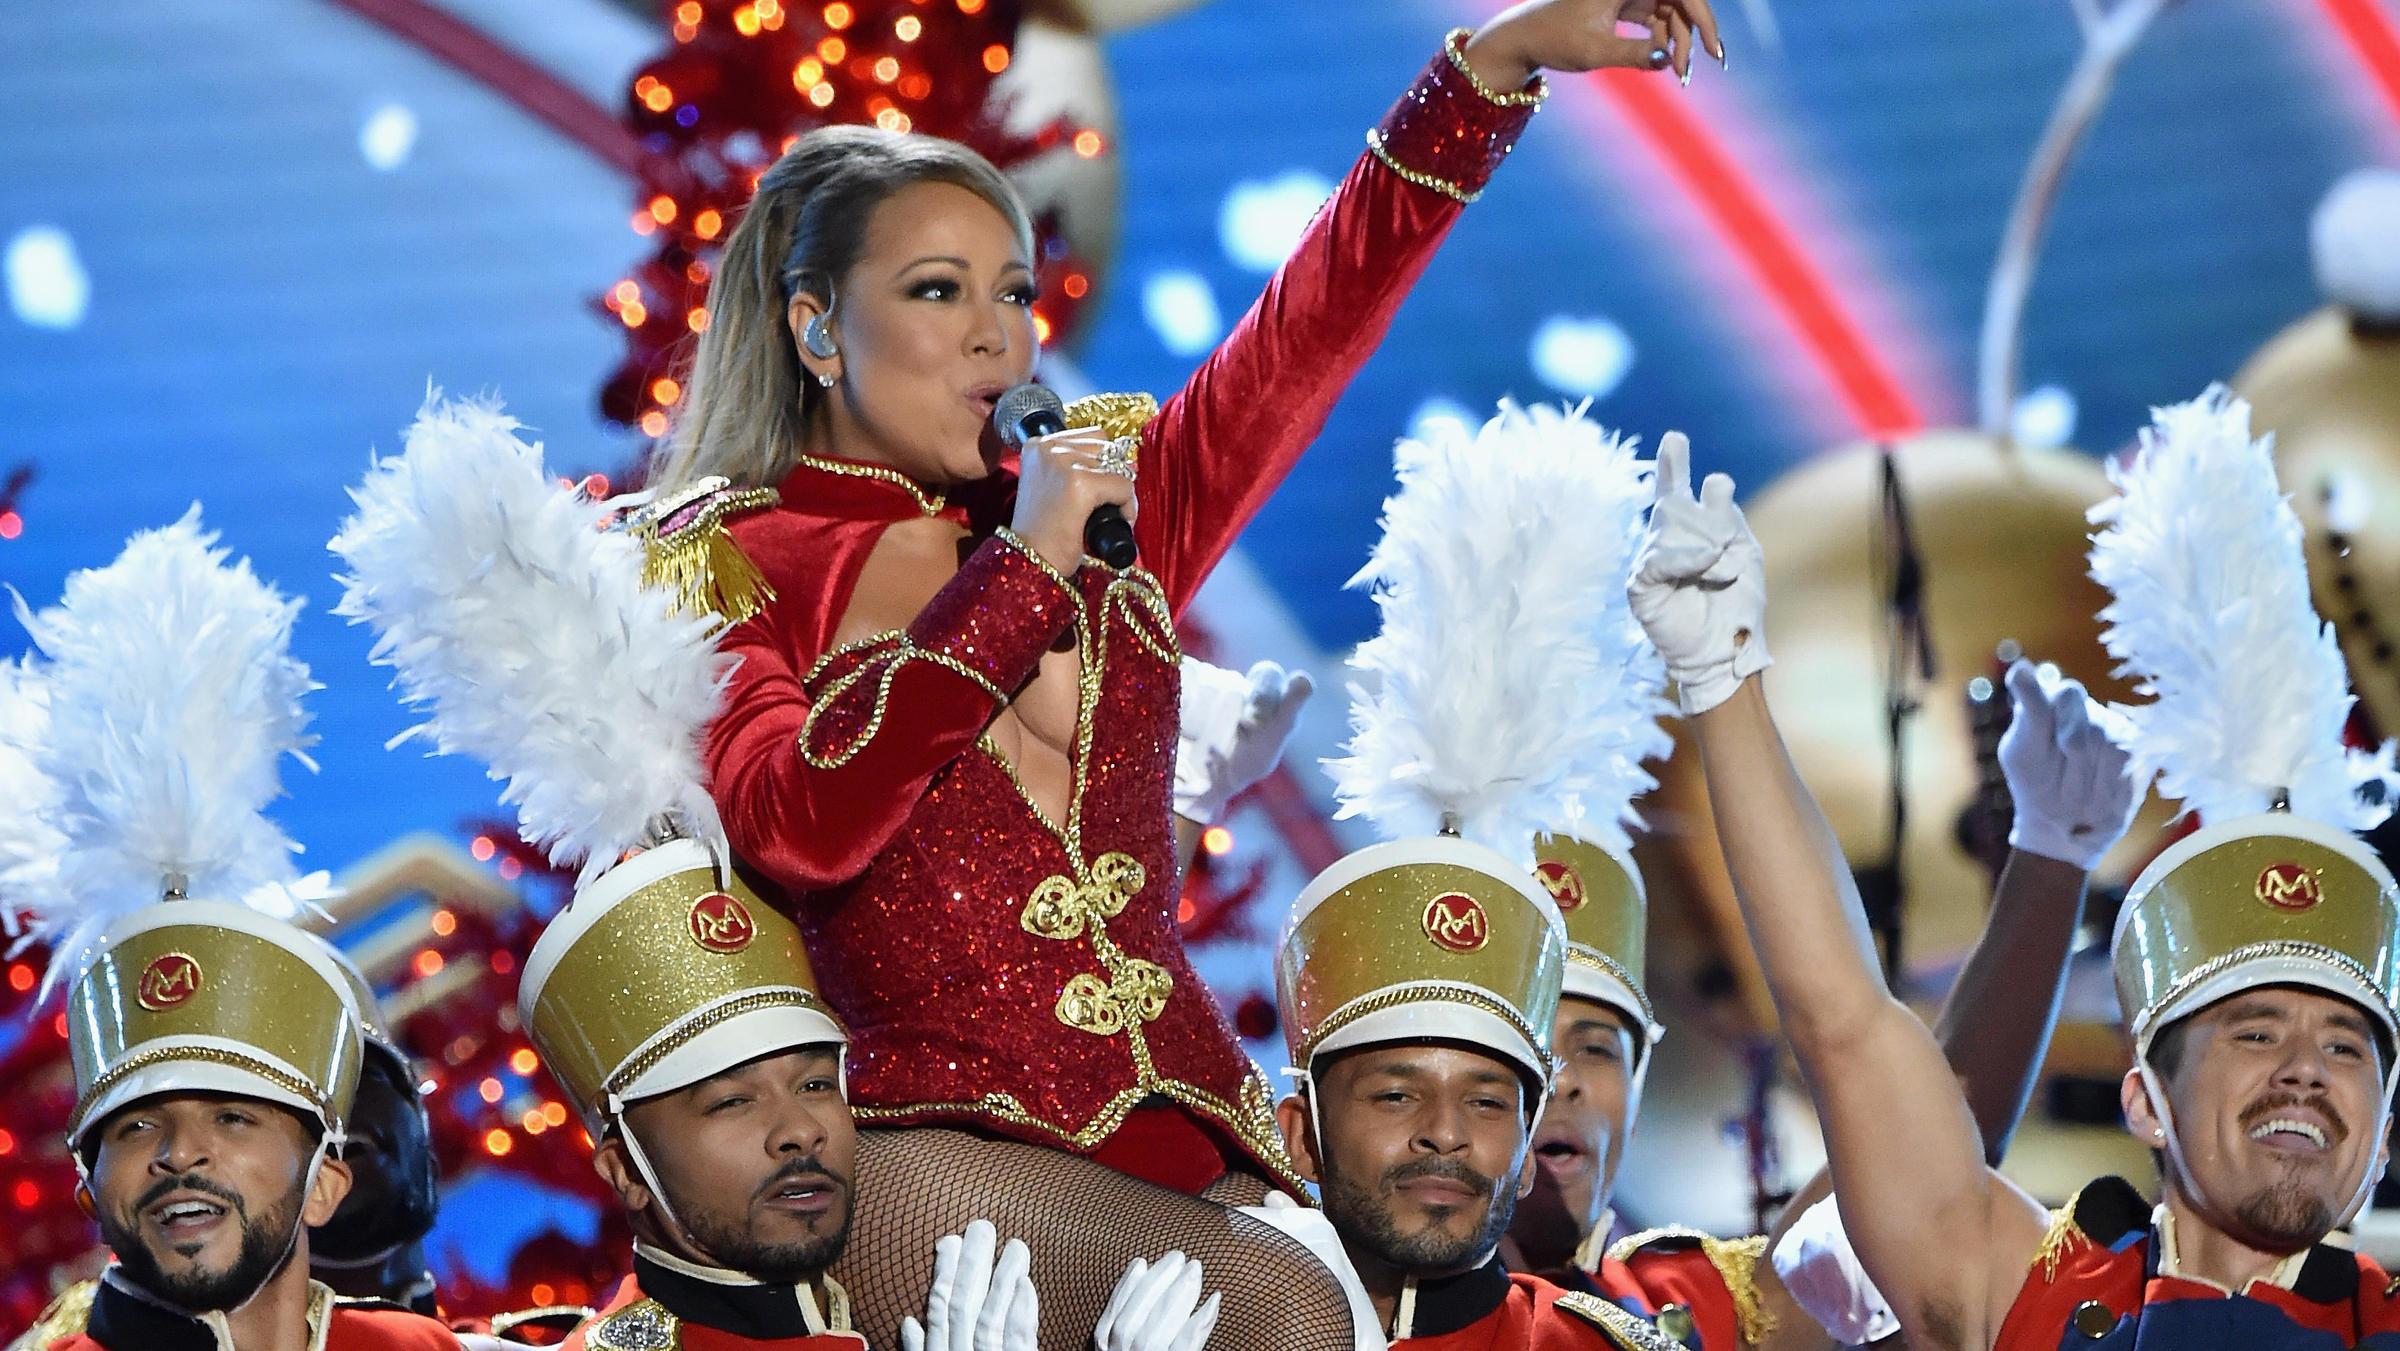 Mariah Carey's 'All I Want